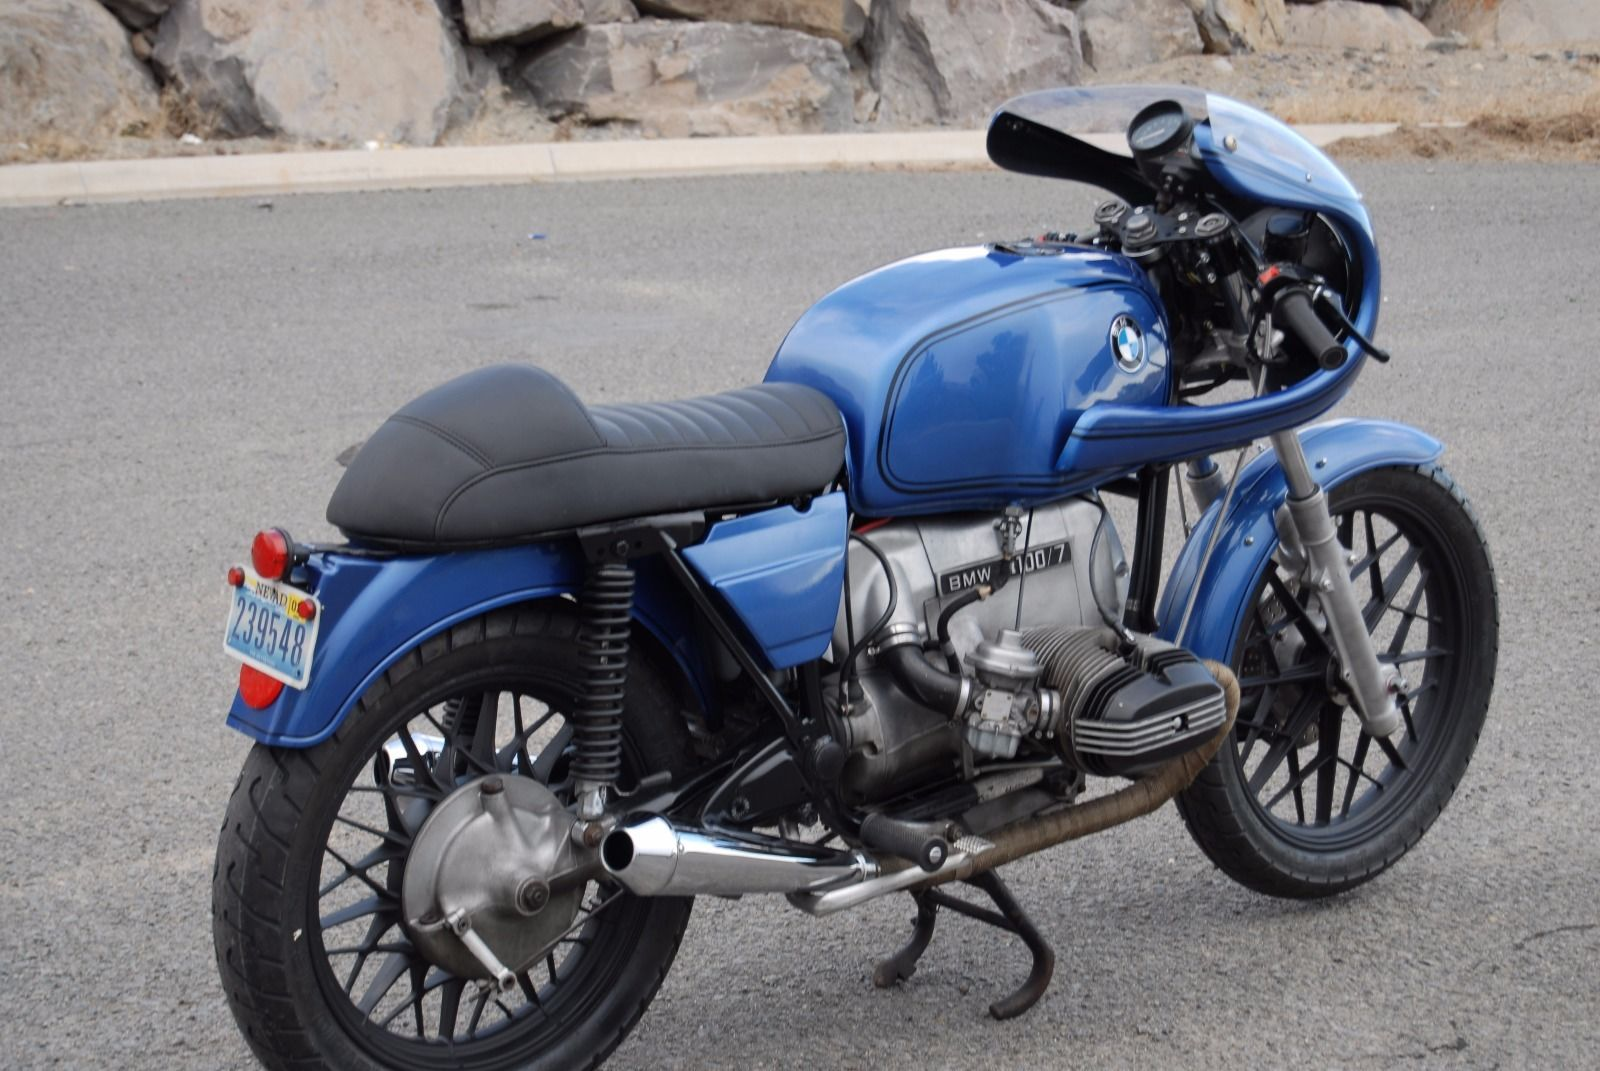 1978 BMW R100 7 Custom Motorcycle Cafe Racer Airhead Bobber